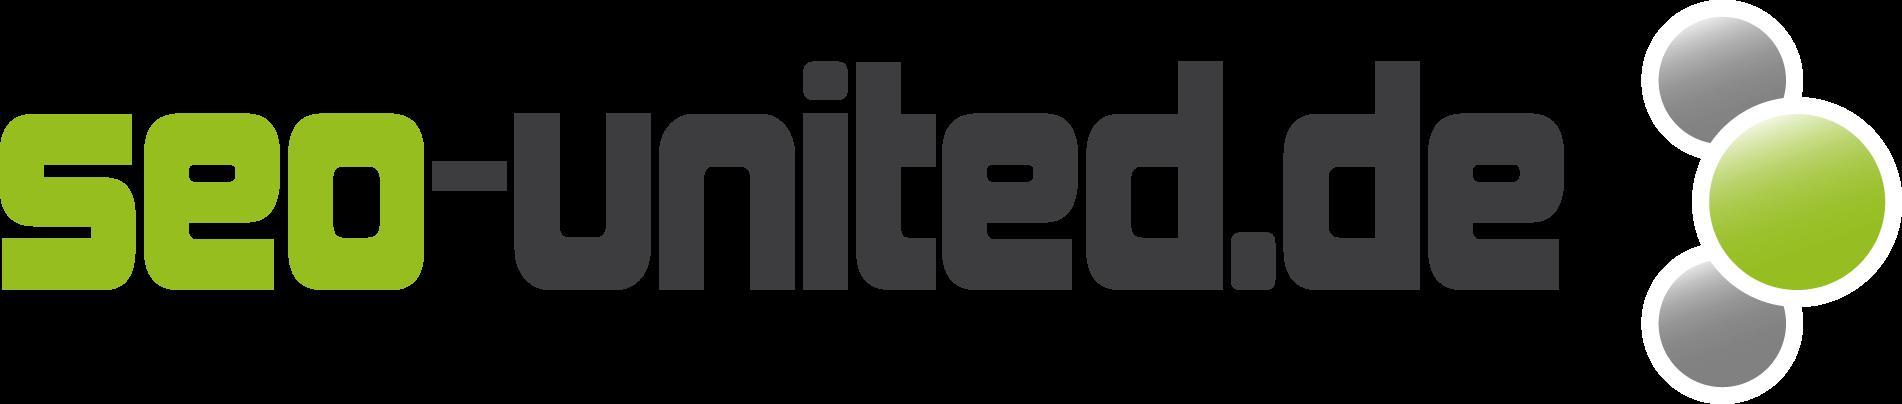 seo-united logo